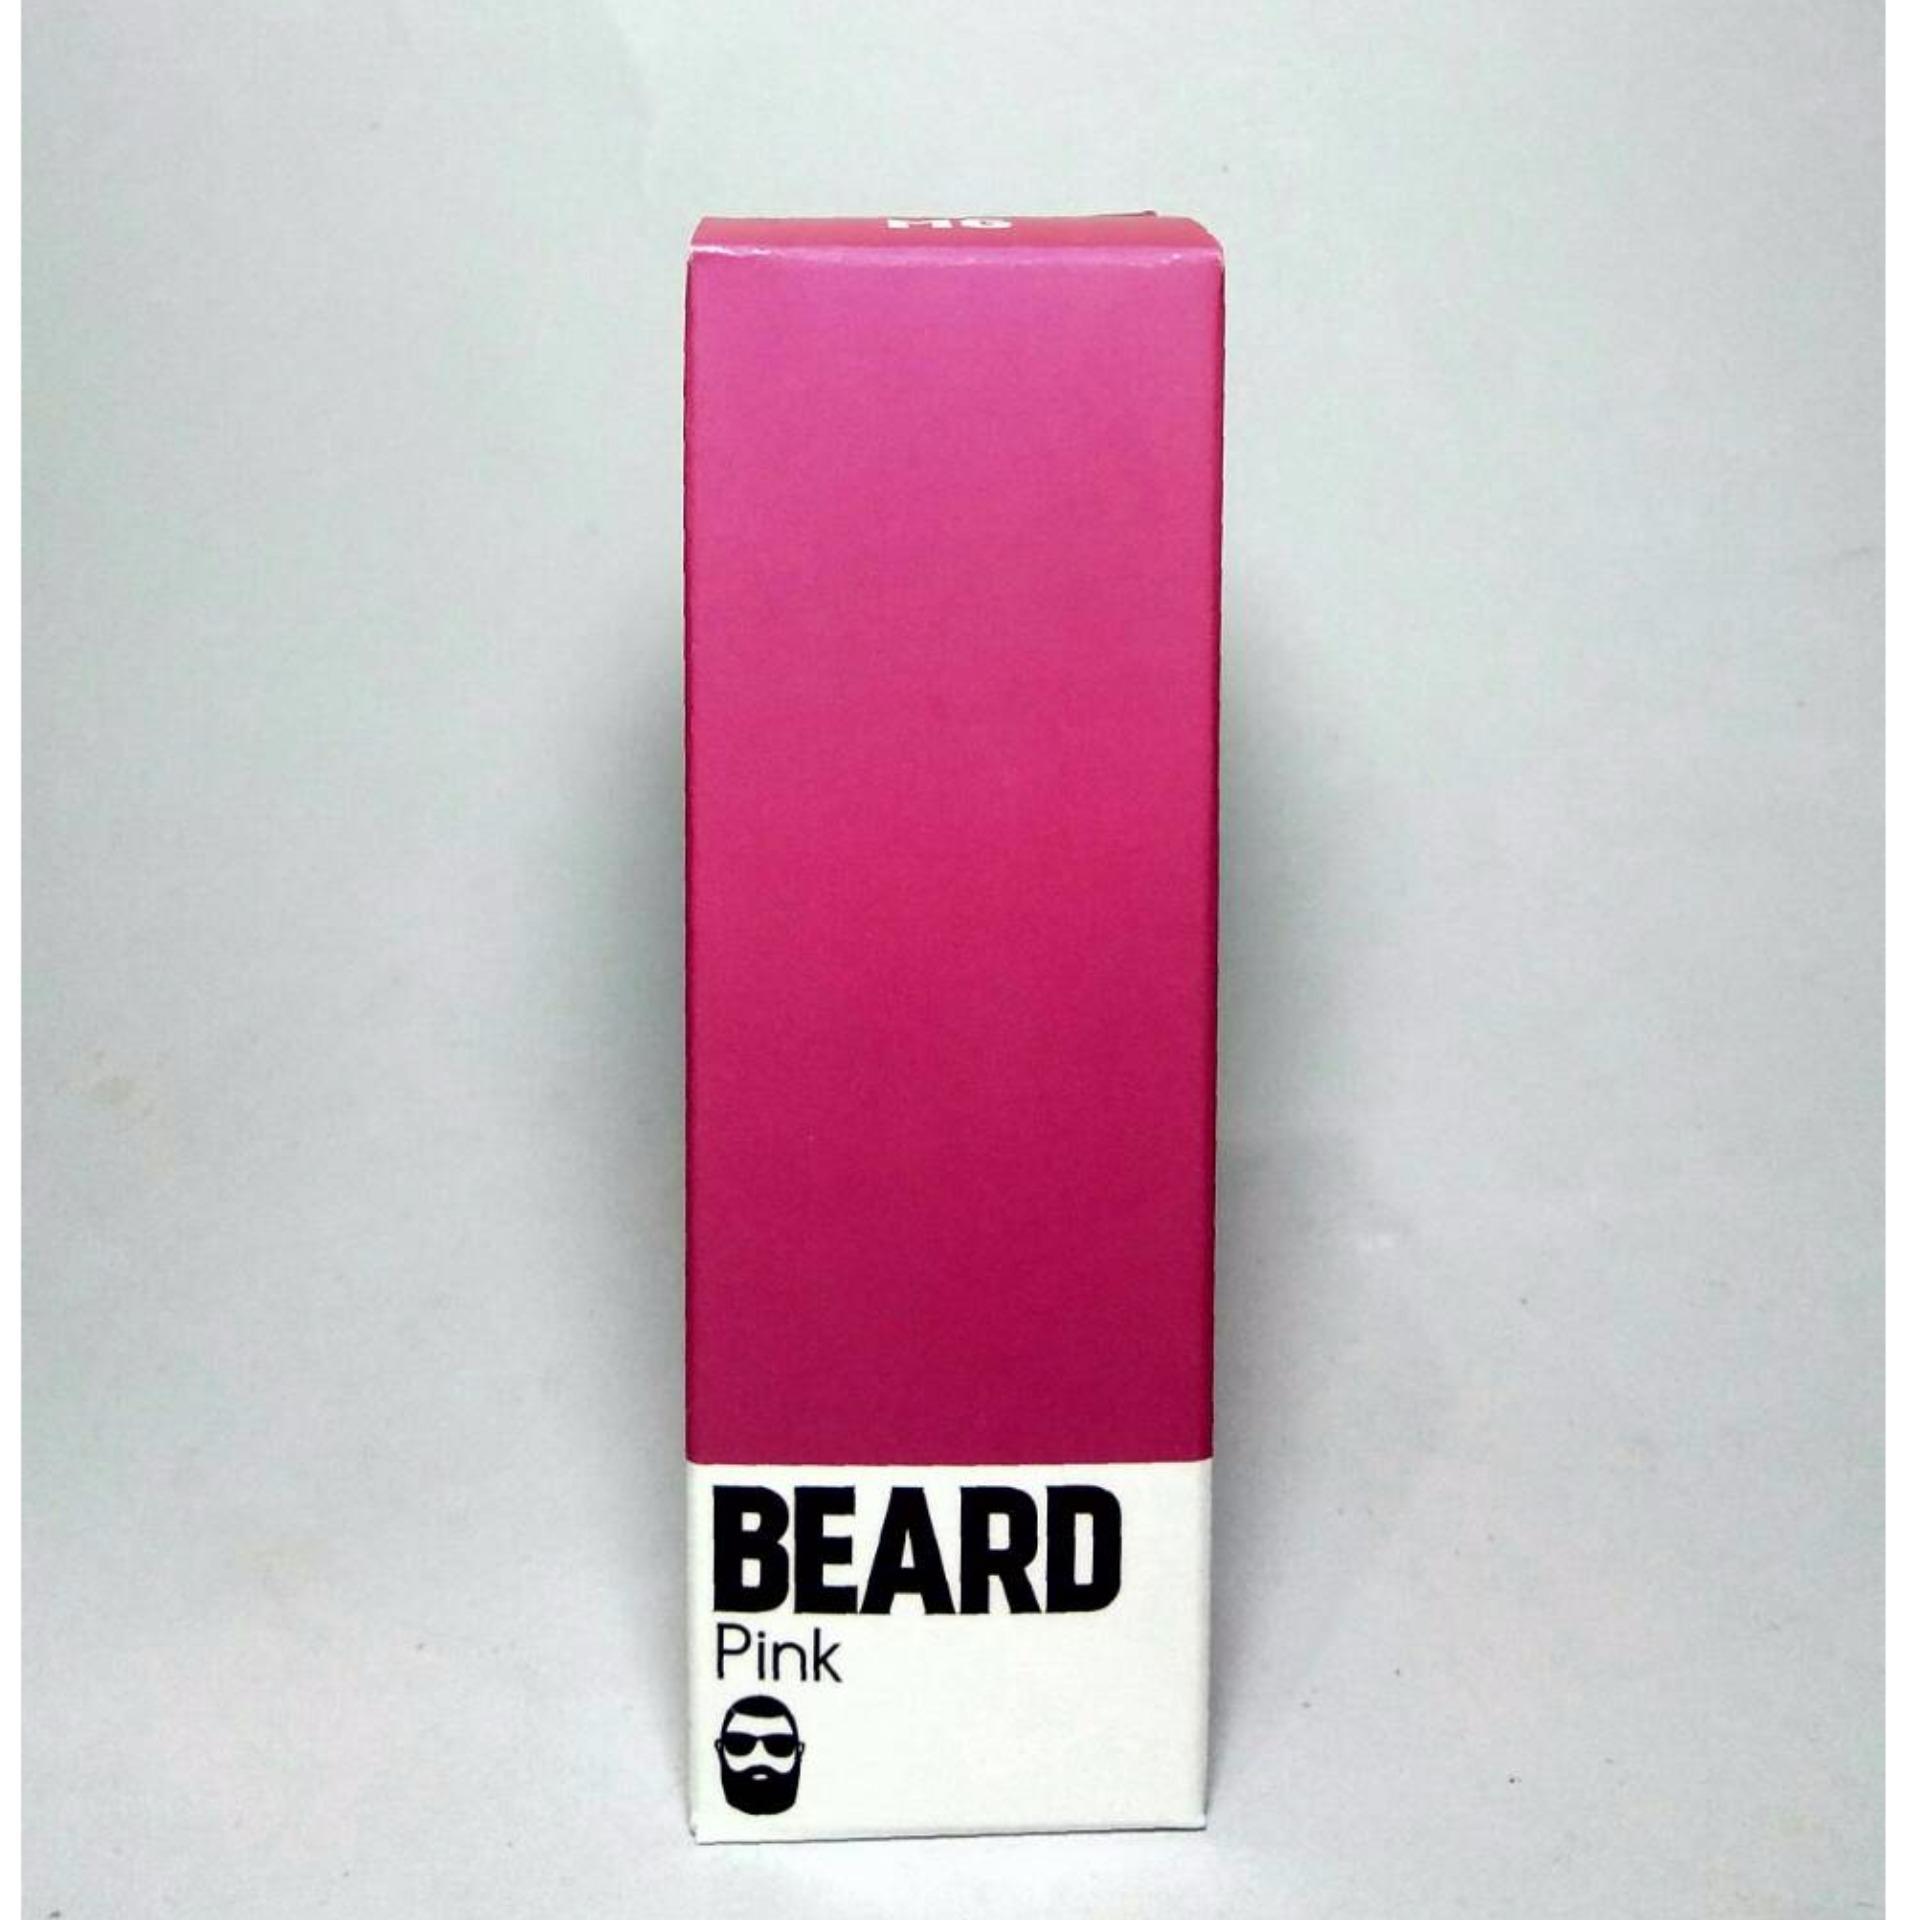 Grappy Premium Liquid Vapor Vape Vaping 3mg 60ml Spec Dan Daftar I Love Donuts Too Usa Jm354 Beard Pink